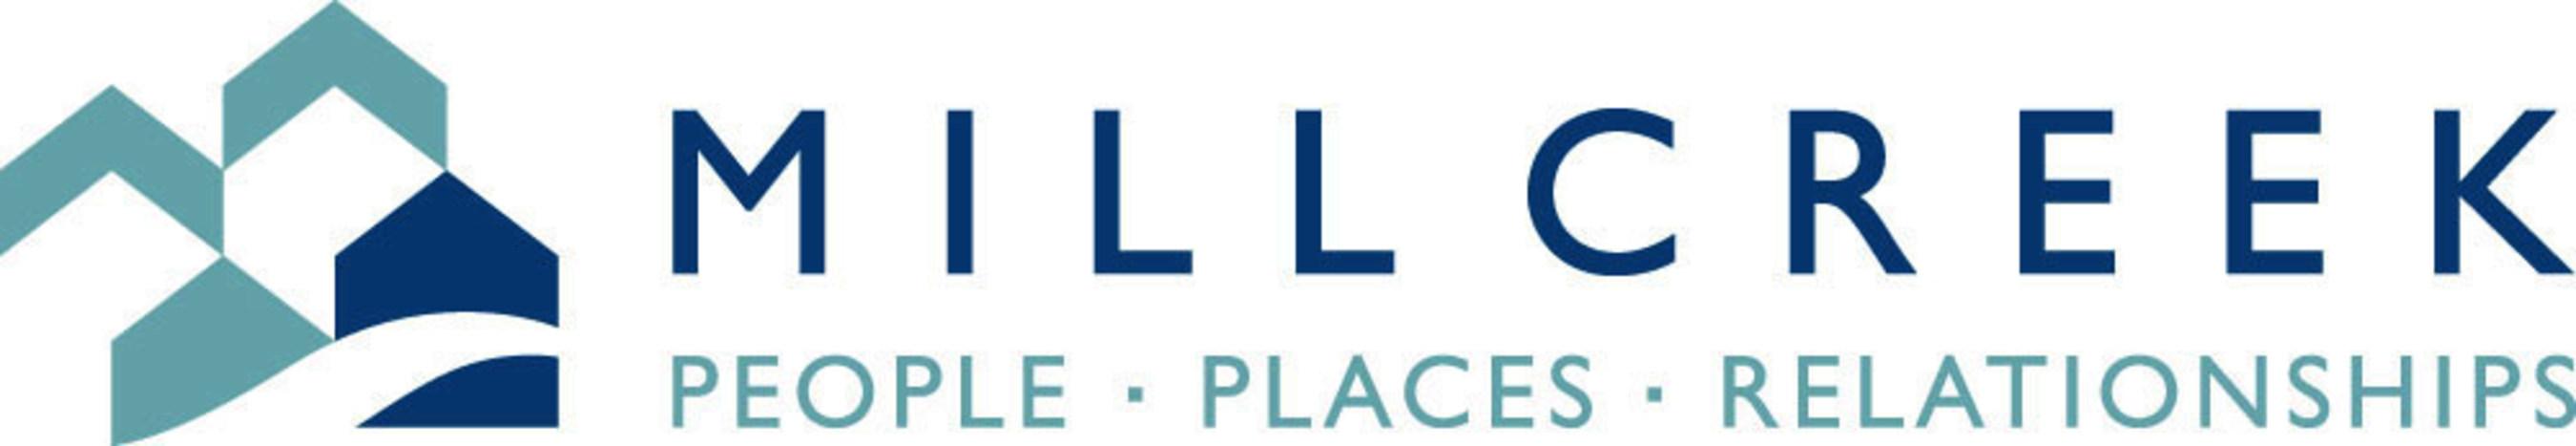 Mill Creek Acquires Former Italian Embassy Building